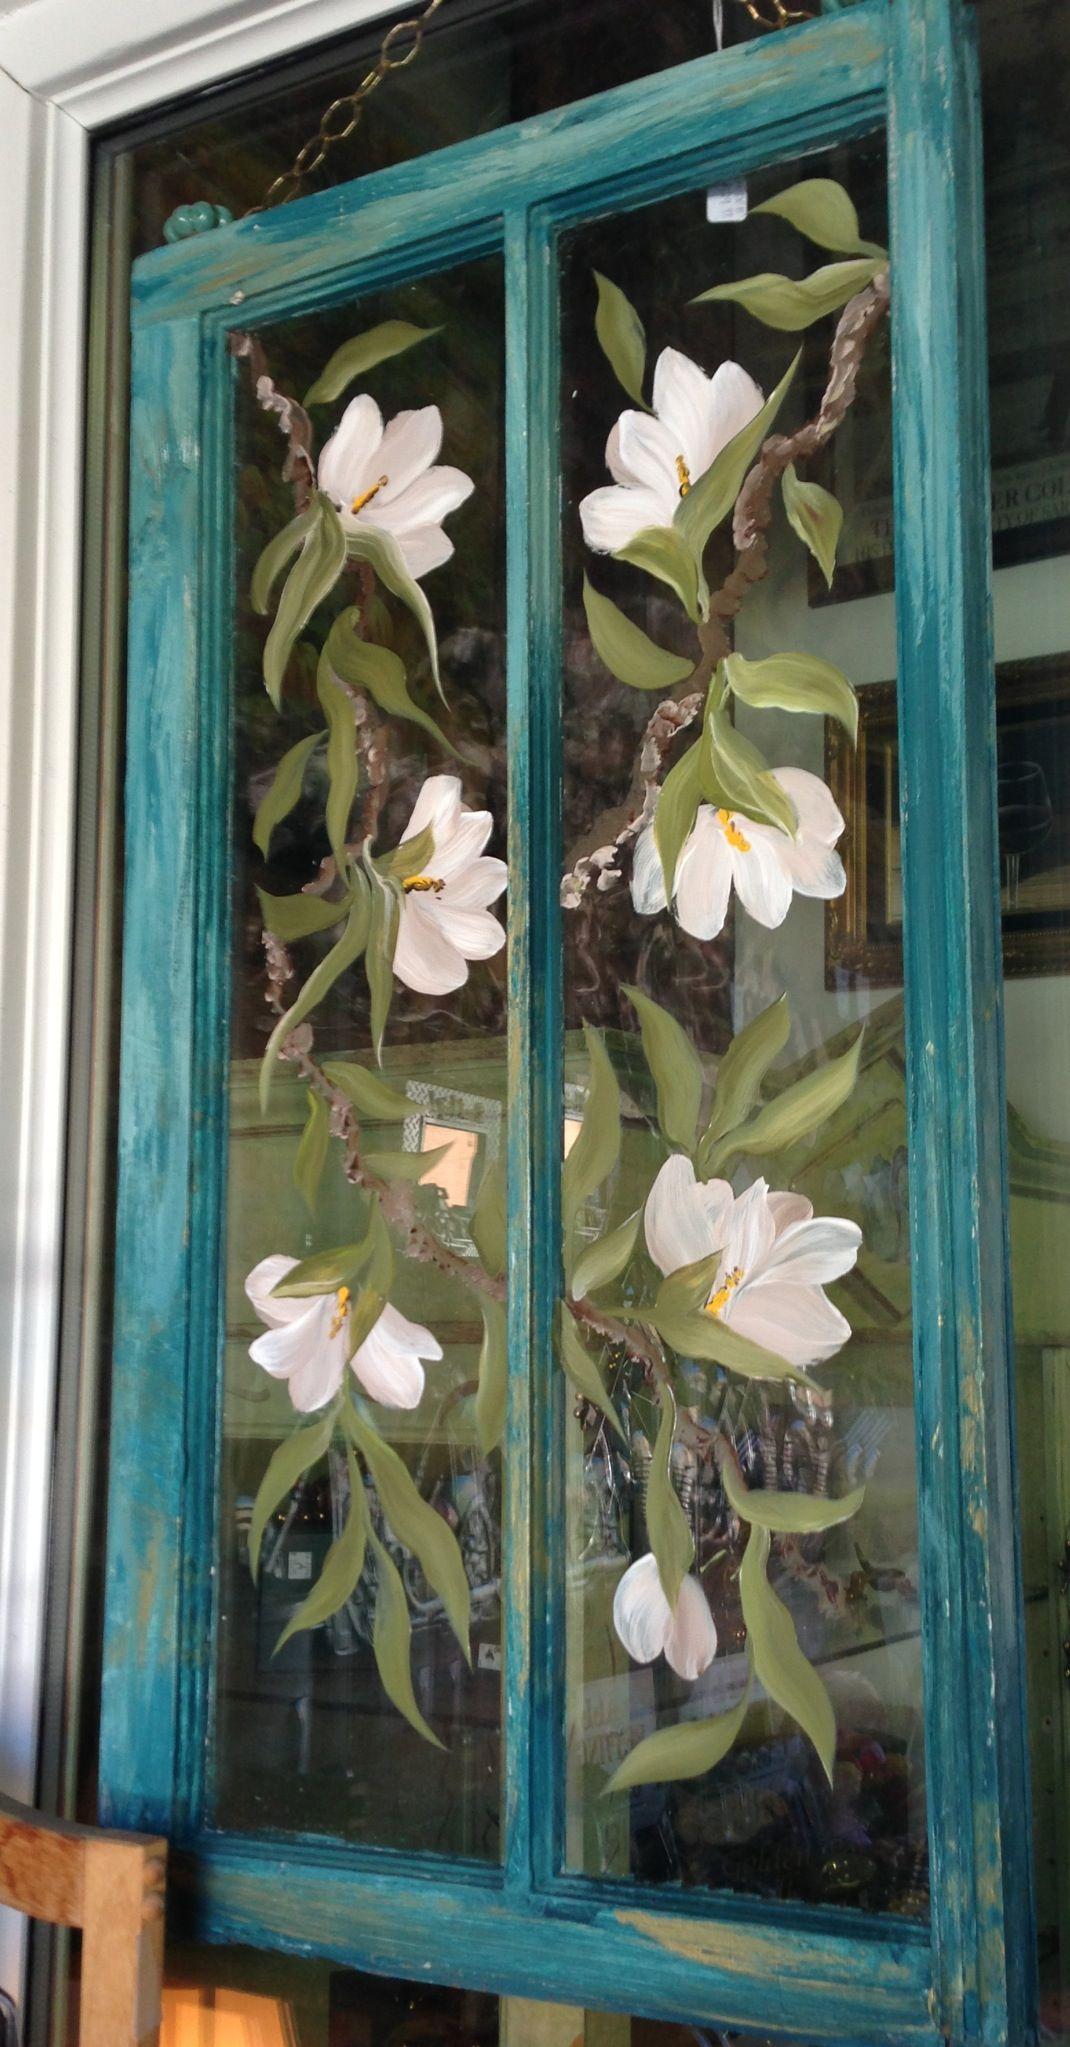 Painted Window Hanging Acrylic Windows Handpainted ღ